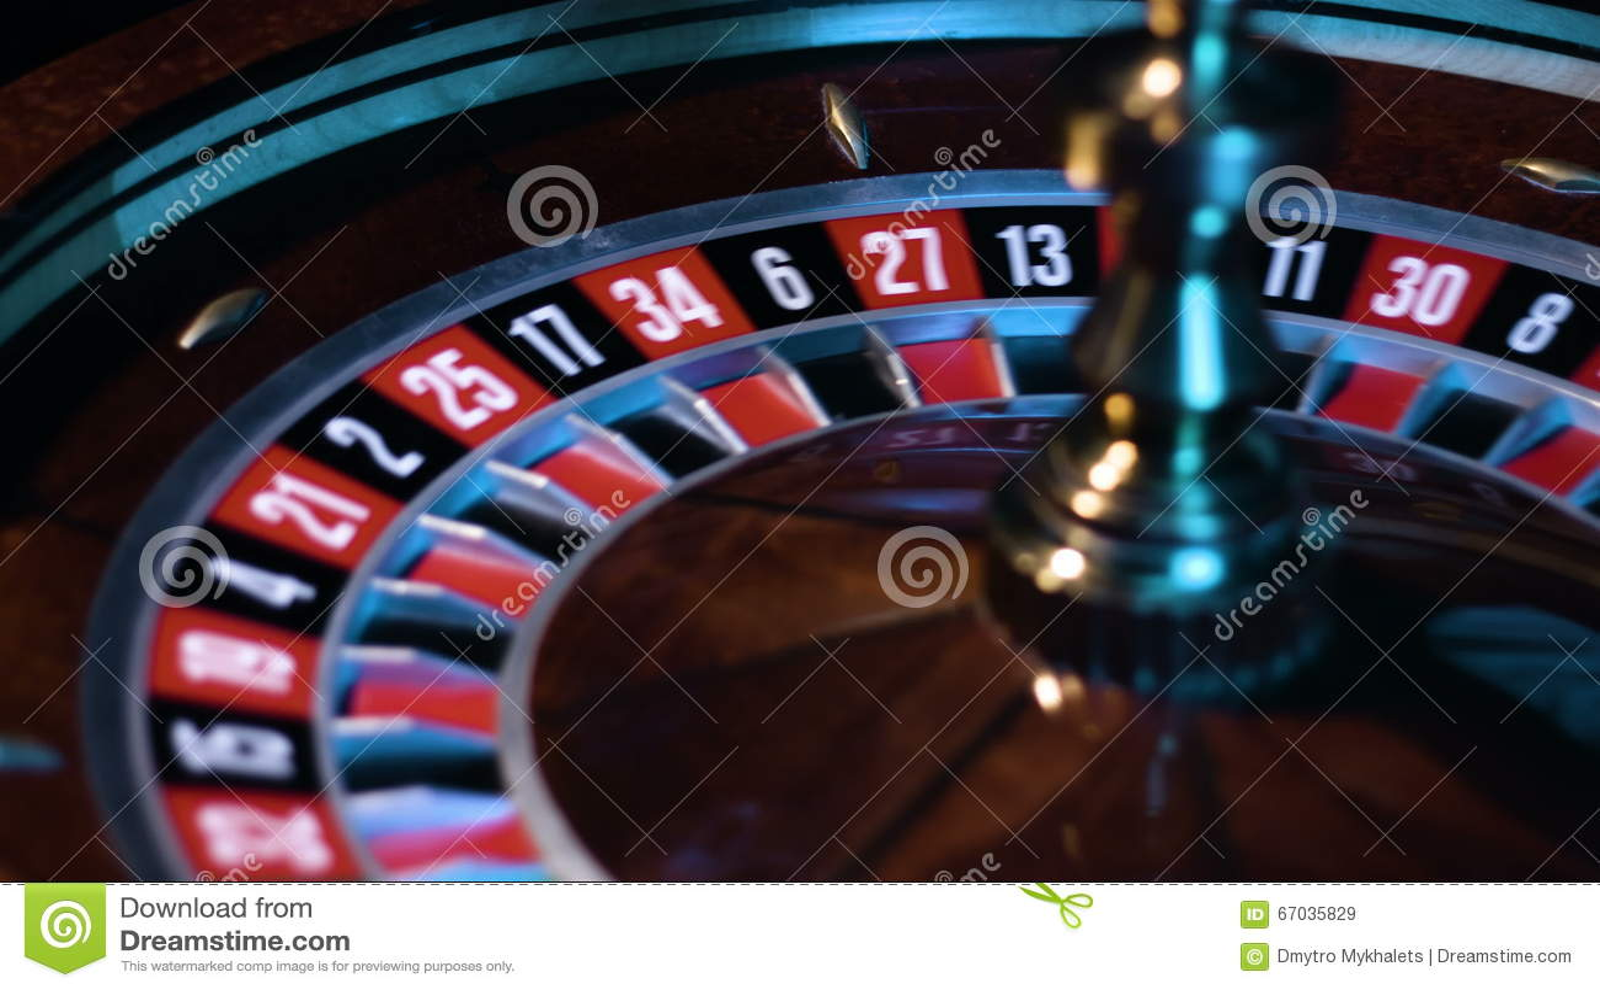 Roulette online flashback - 77913